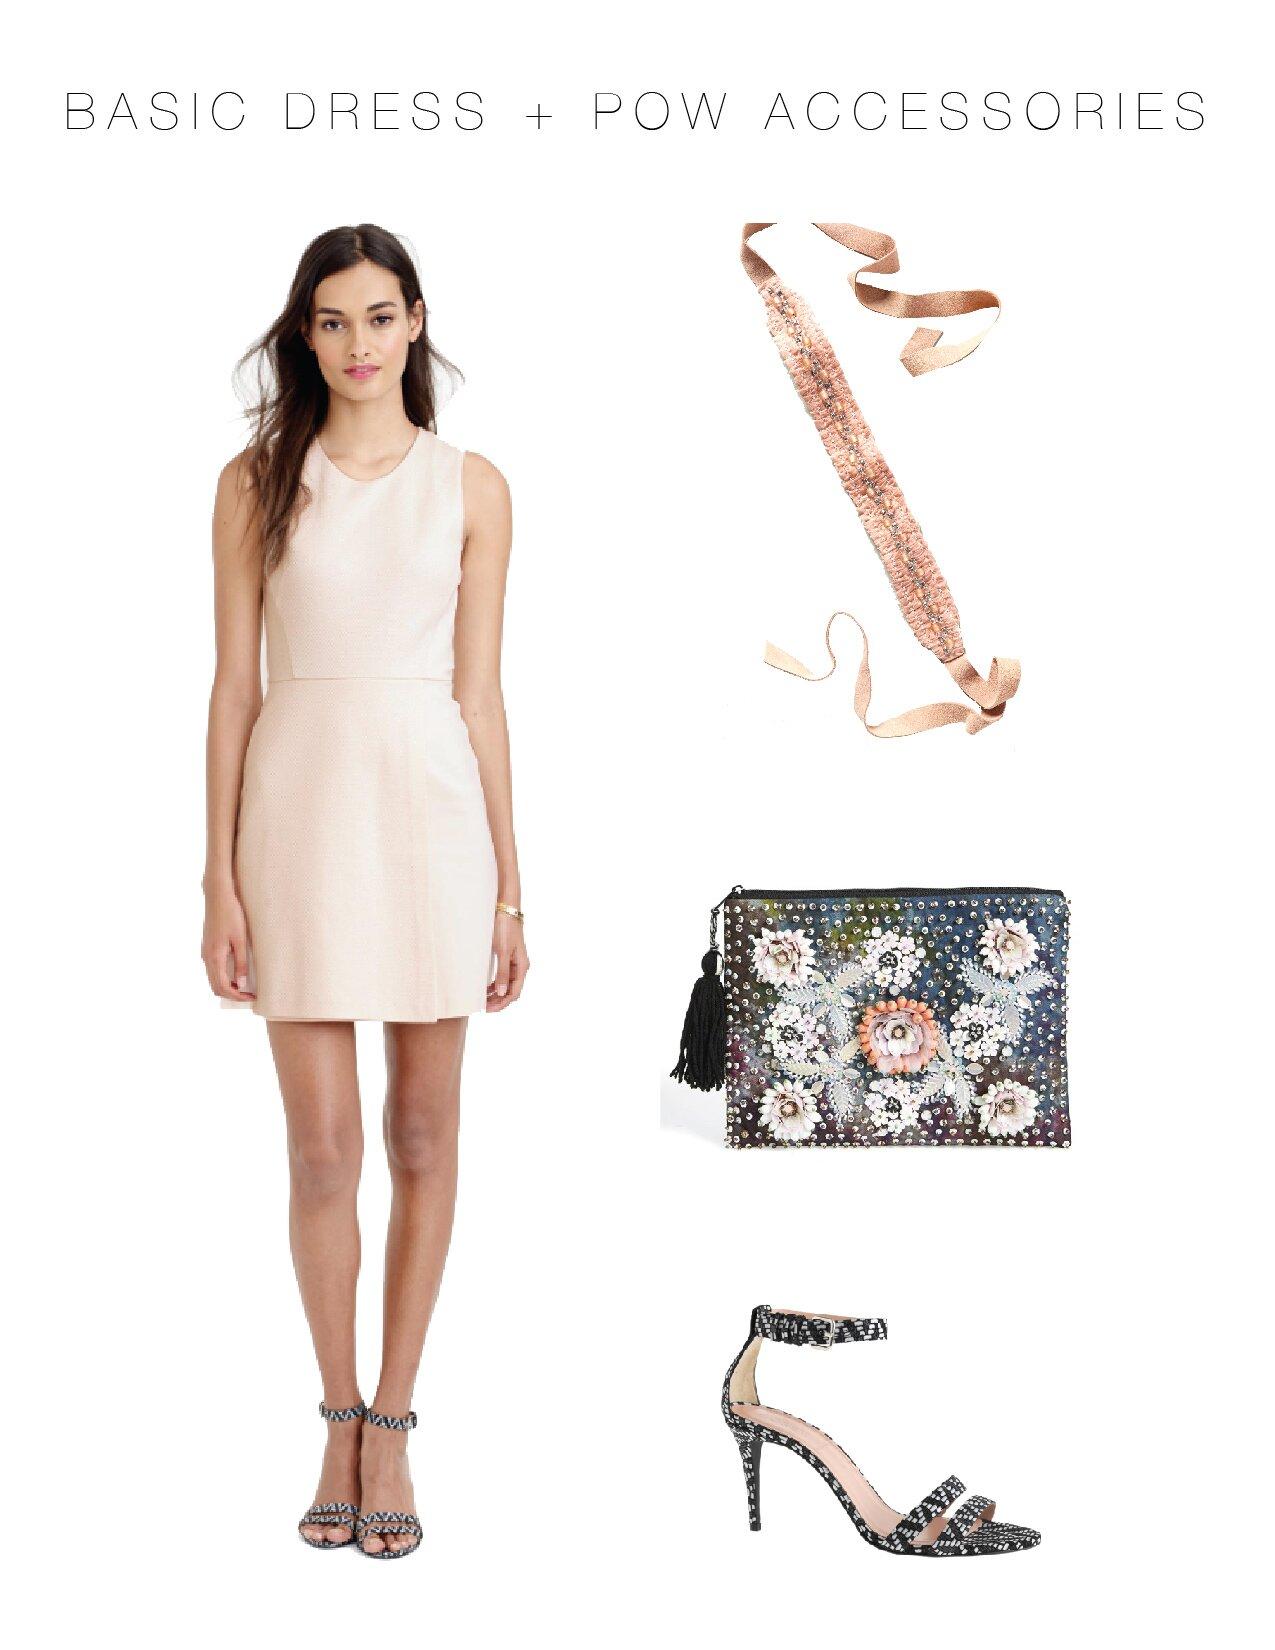 Emejing Nordstrom Wedding Guest Dresses Images - Styles & Ideas ...